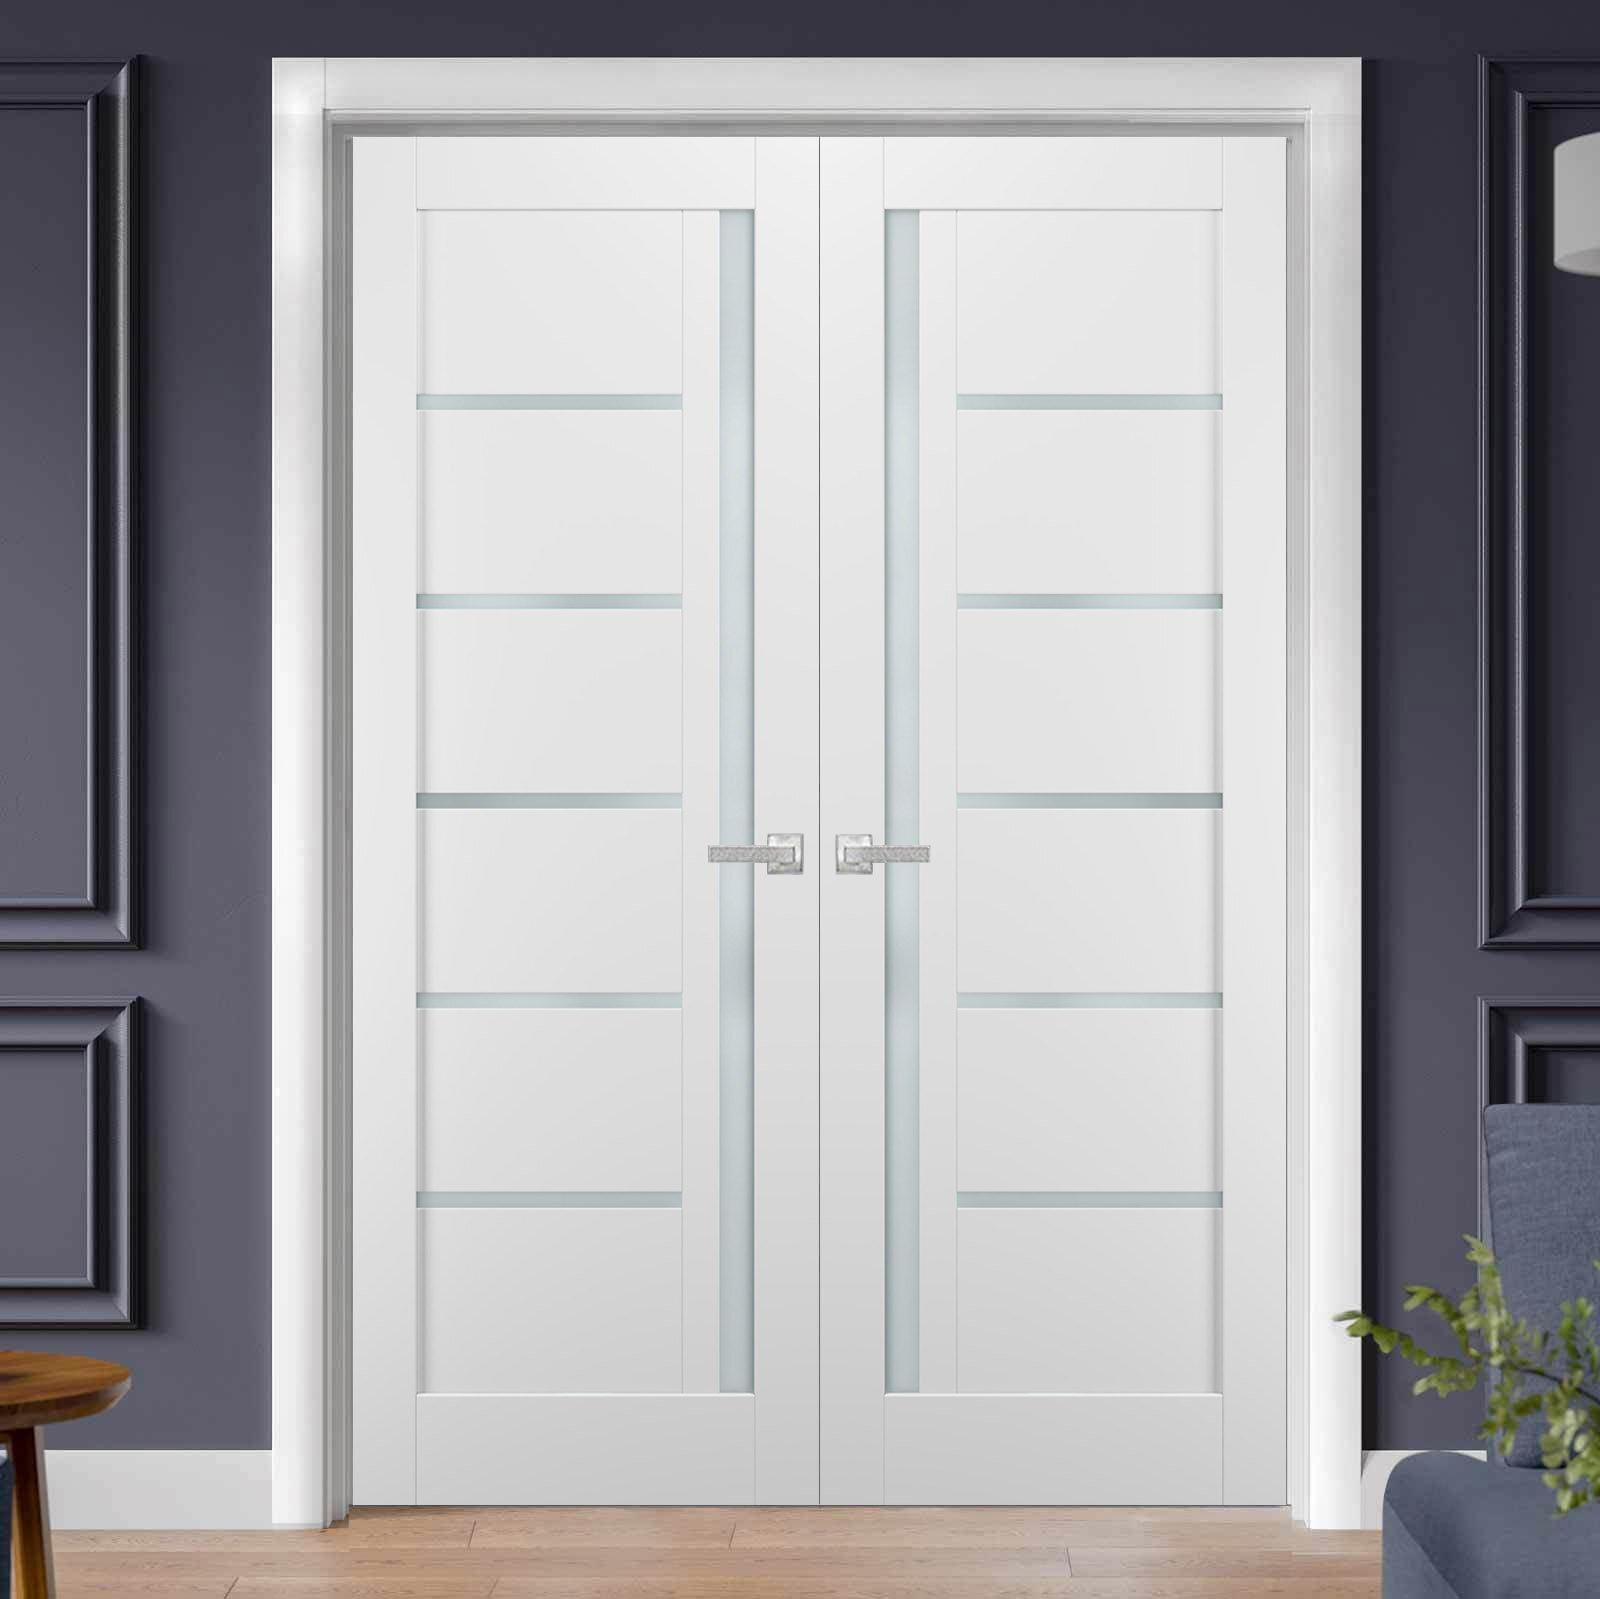 Sartodoors Quadro Glass French Doors With Installation Hardware Kit Wayfair